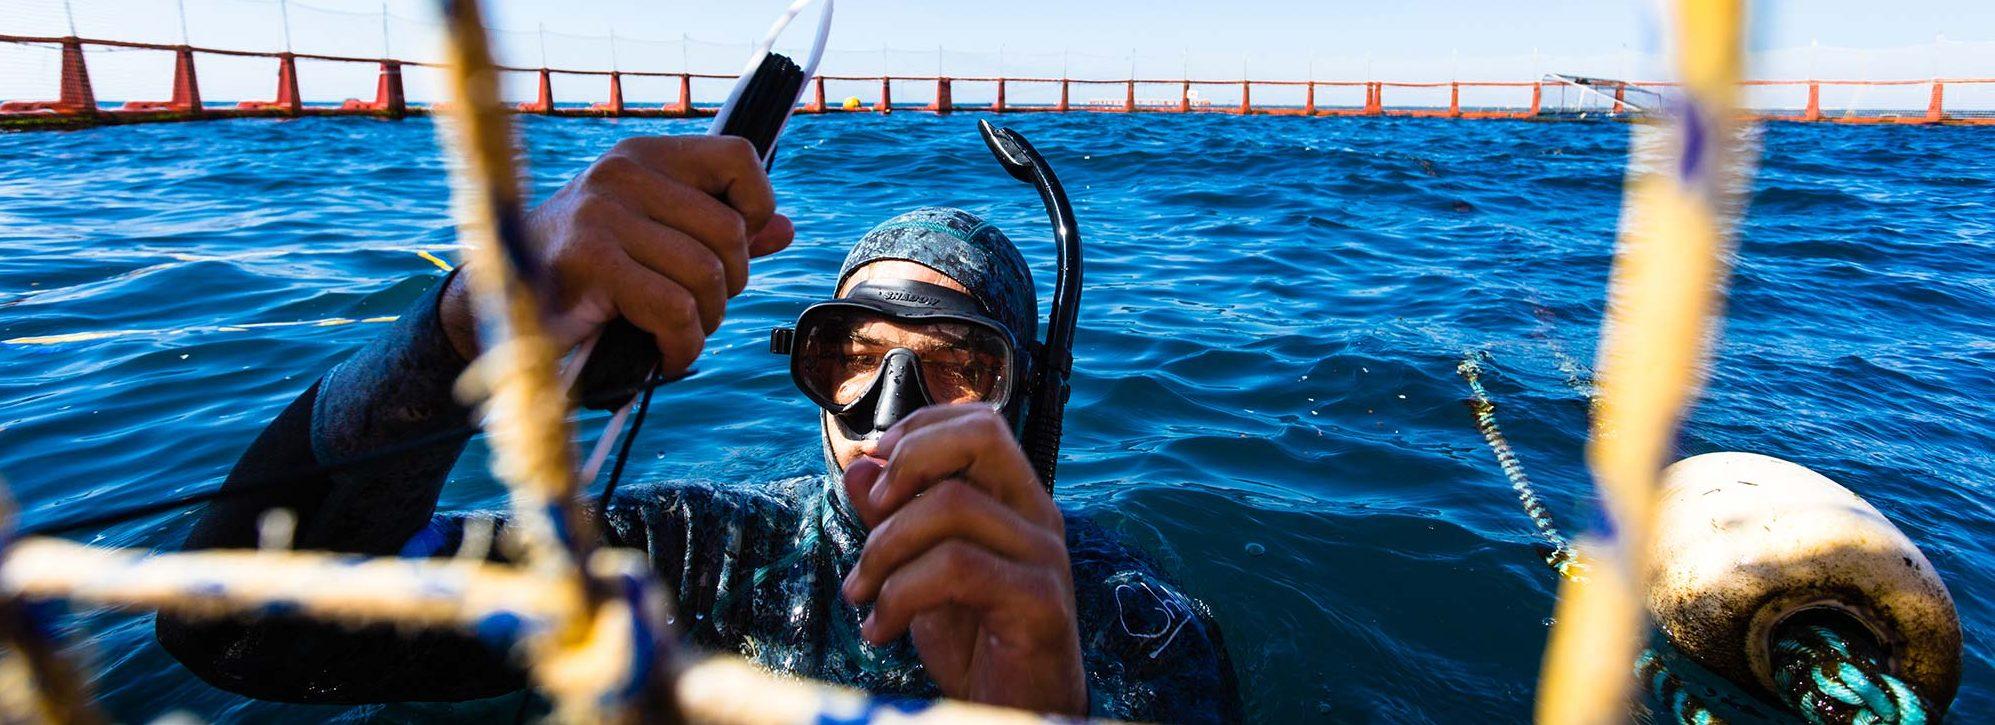 Quality - Australian Fishing Enterprises